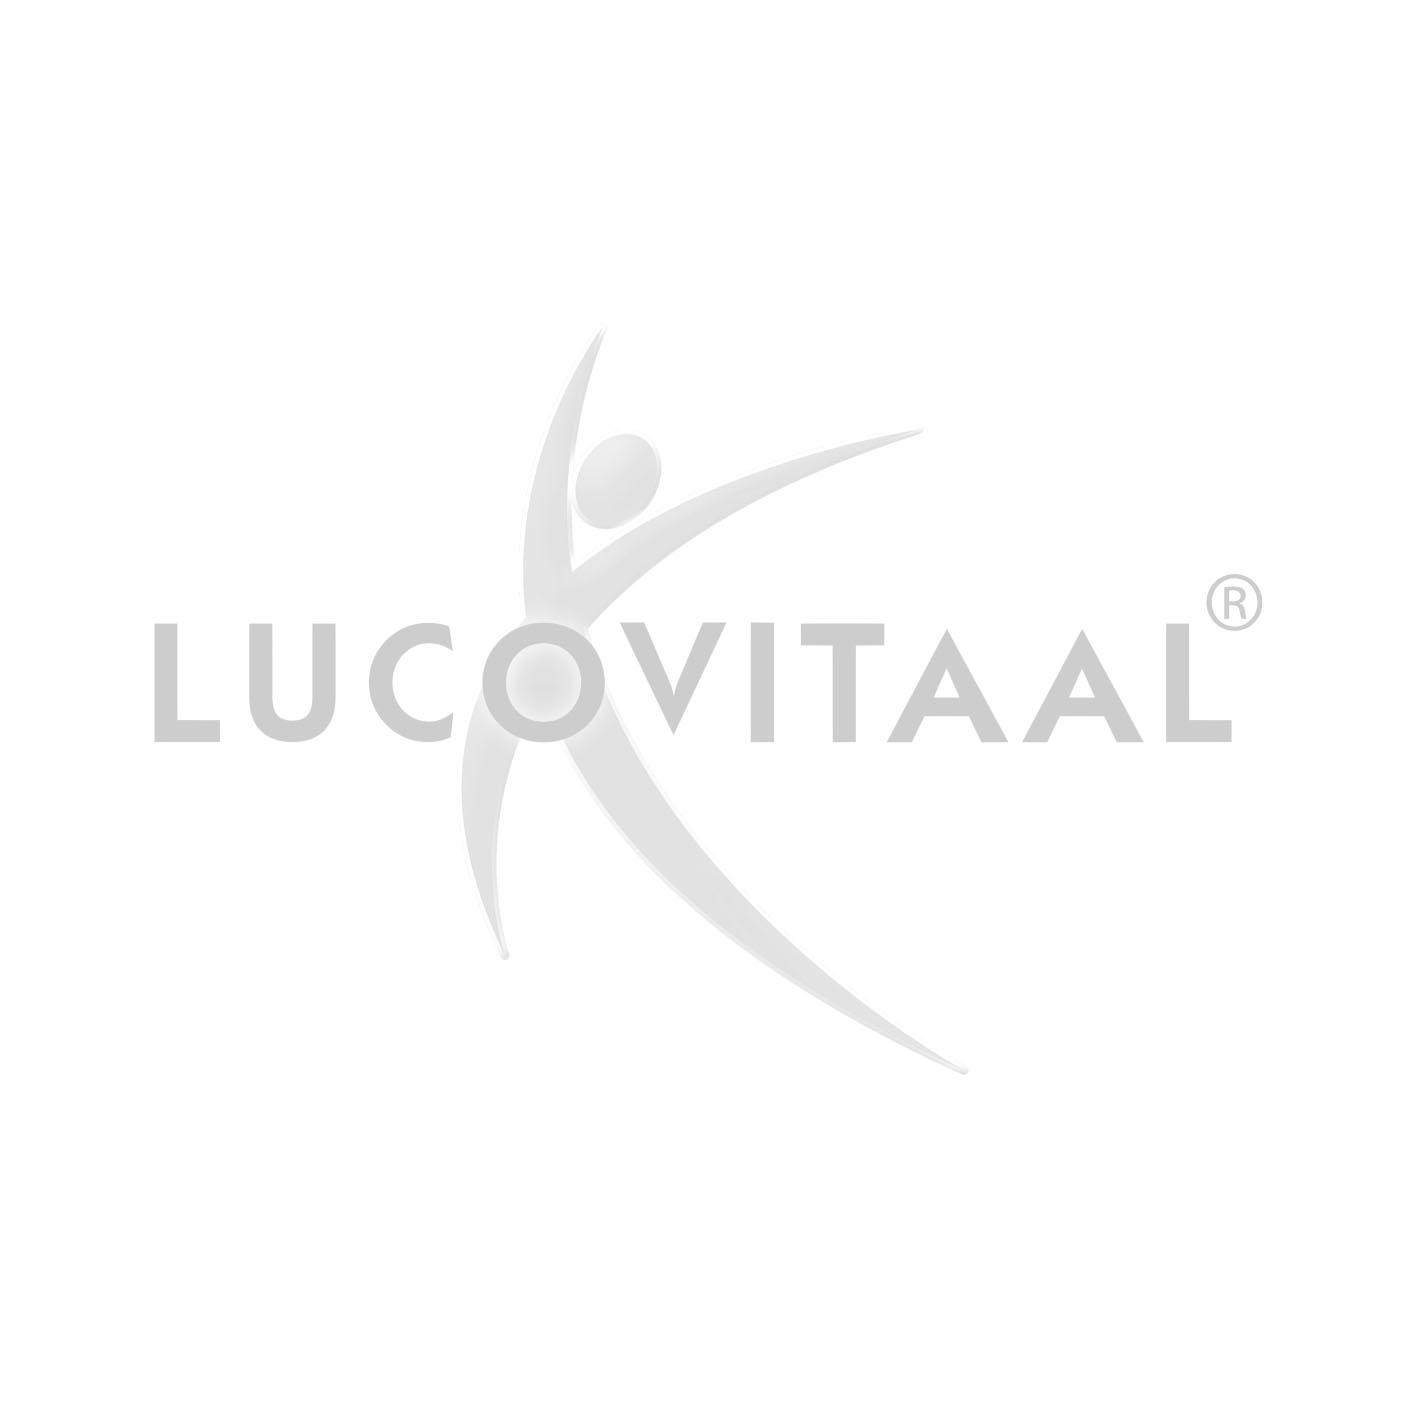 chlorella spirulina lucovitaal